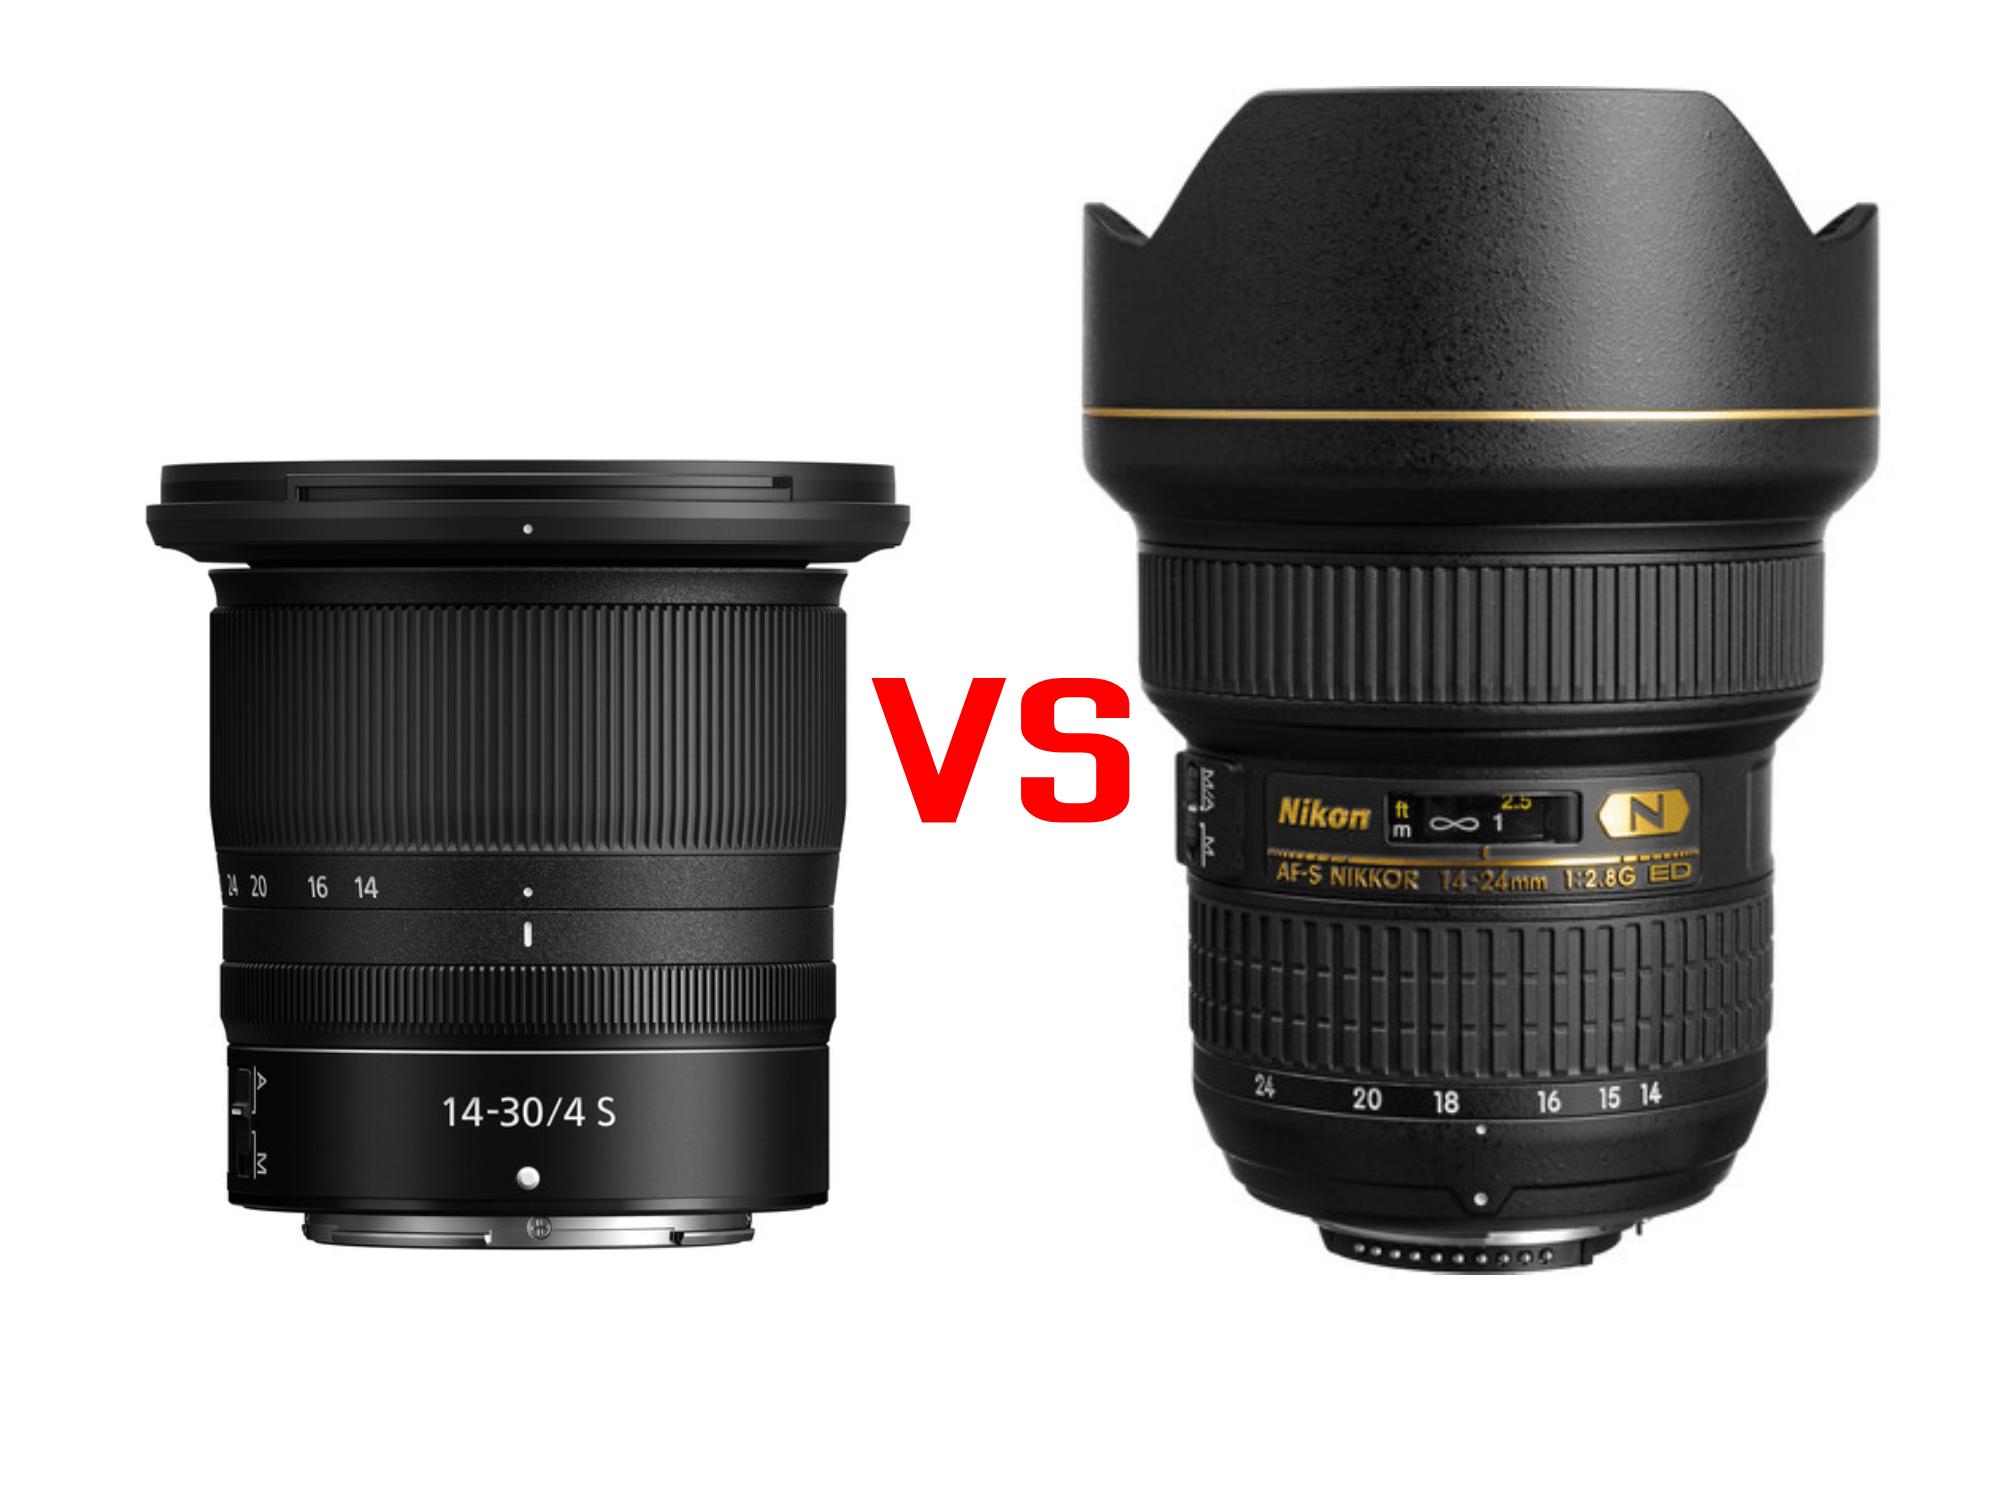 nikon 14 30mm f4 vs nikon 14 24mm f2.8 image